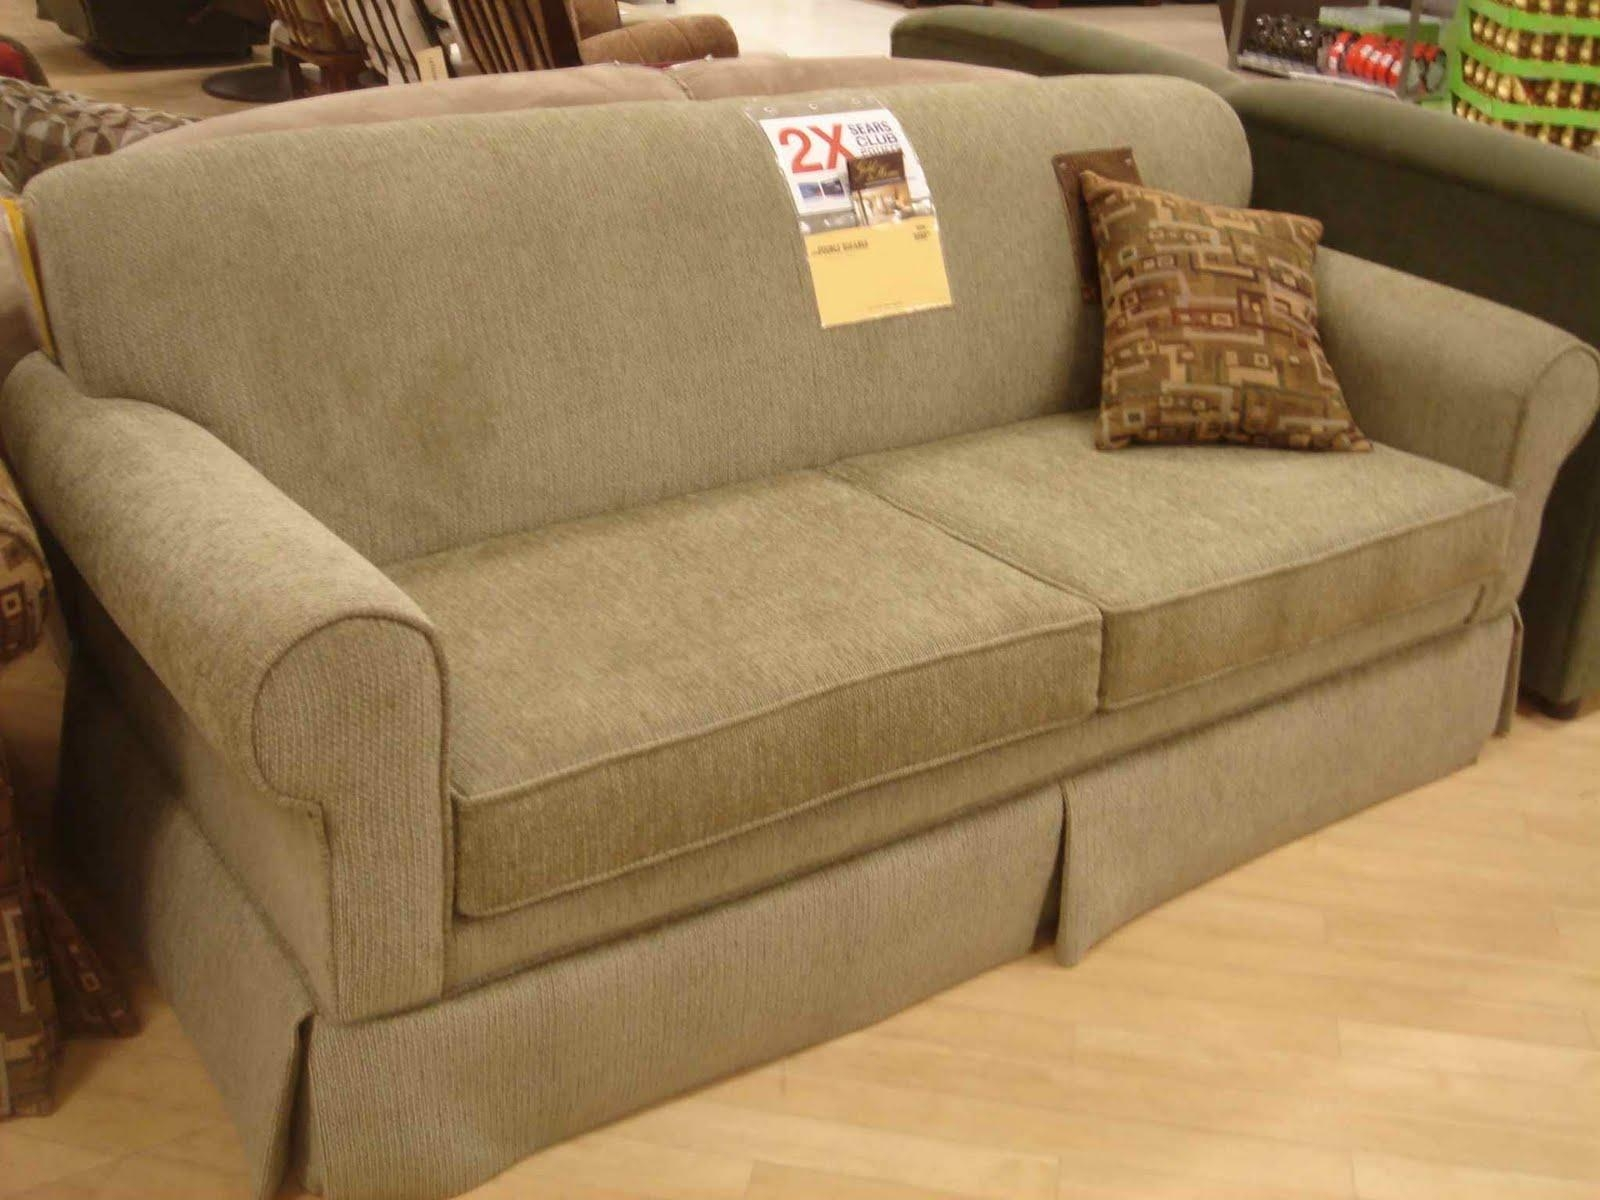 Loveseat Sleeper Sofa Sears | Tehranmix Decoration With Regard To Sears Sofa (Image 15 of 20)